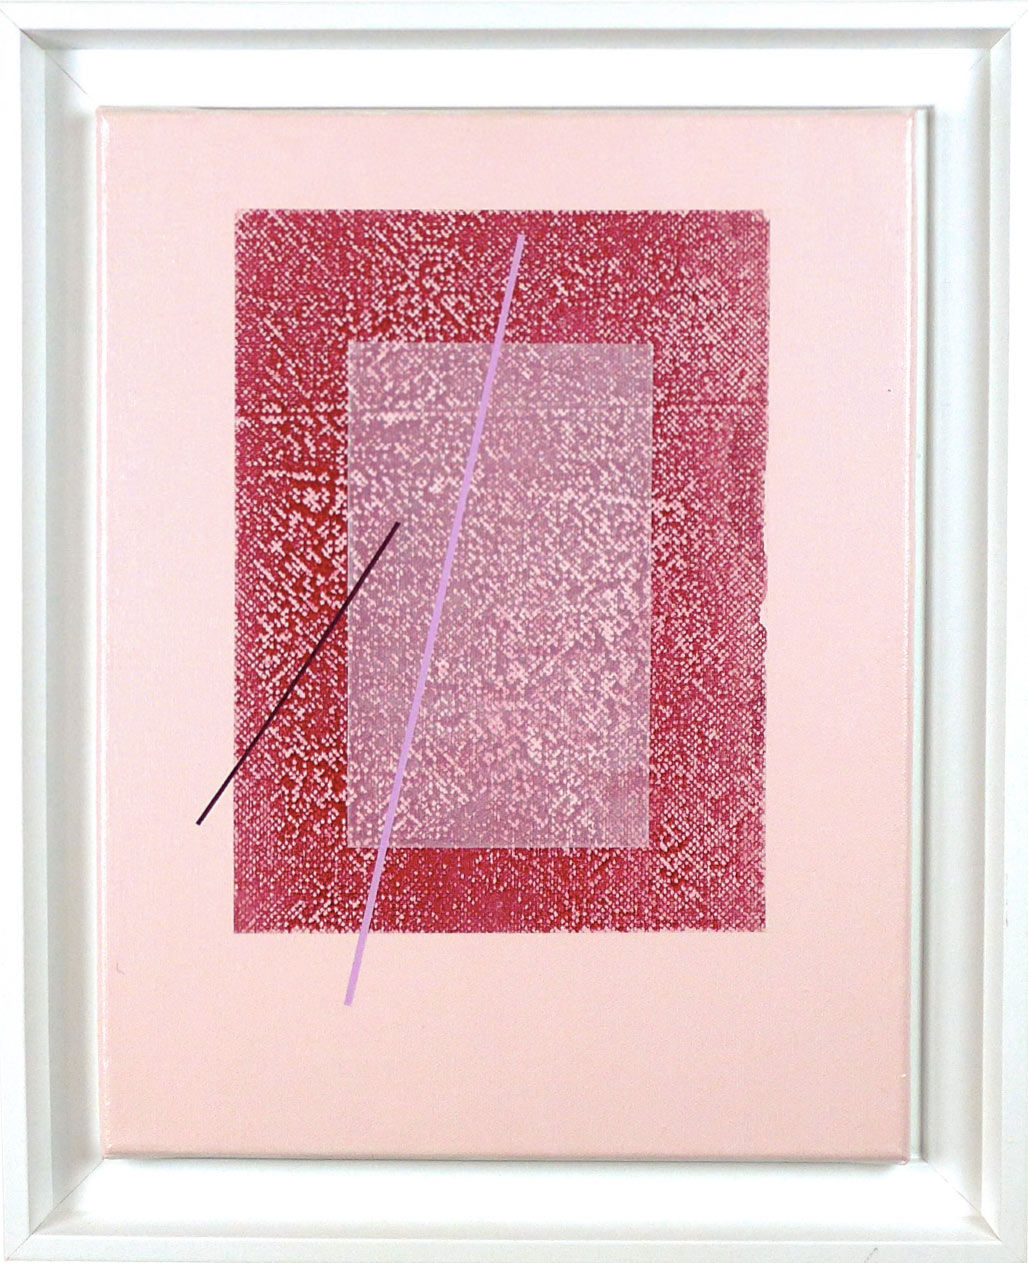 Carlos Stoffel - Tableau - Rose carré rouge